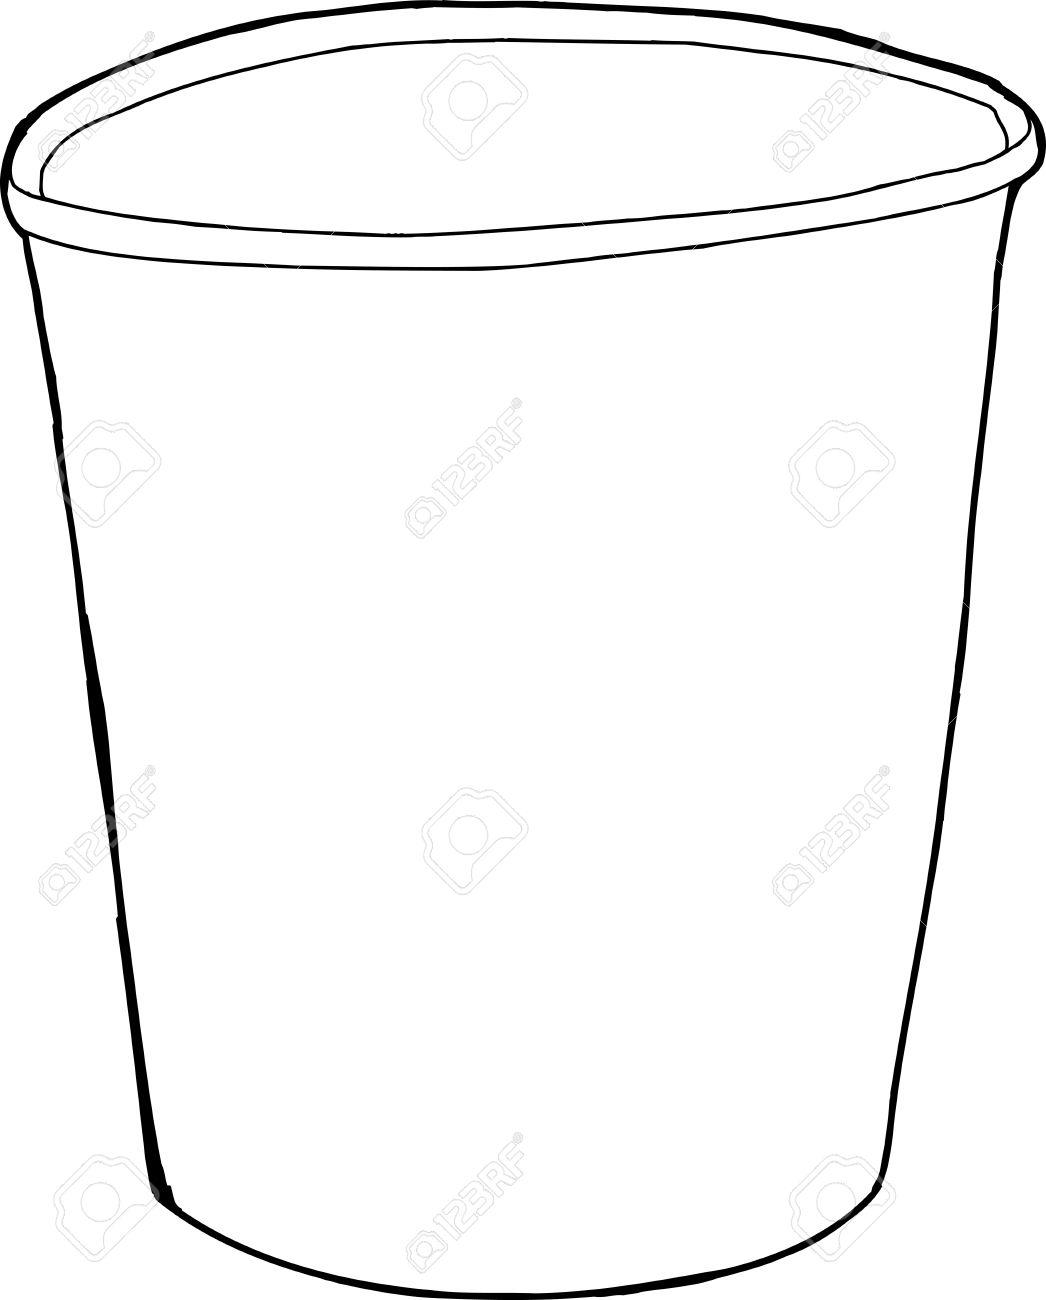 Styrofoam Cup Drawing At Getdrawings